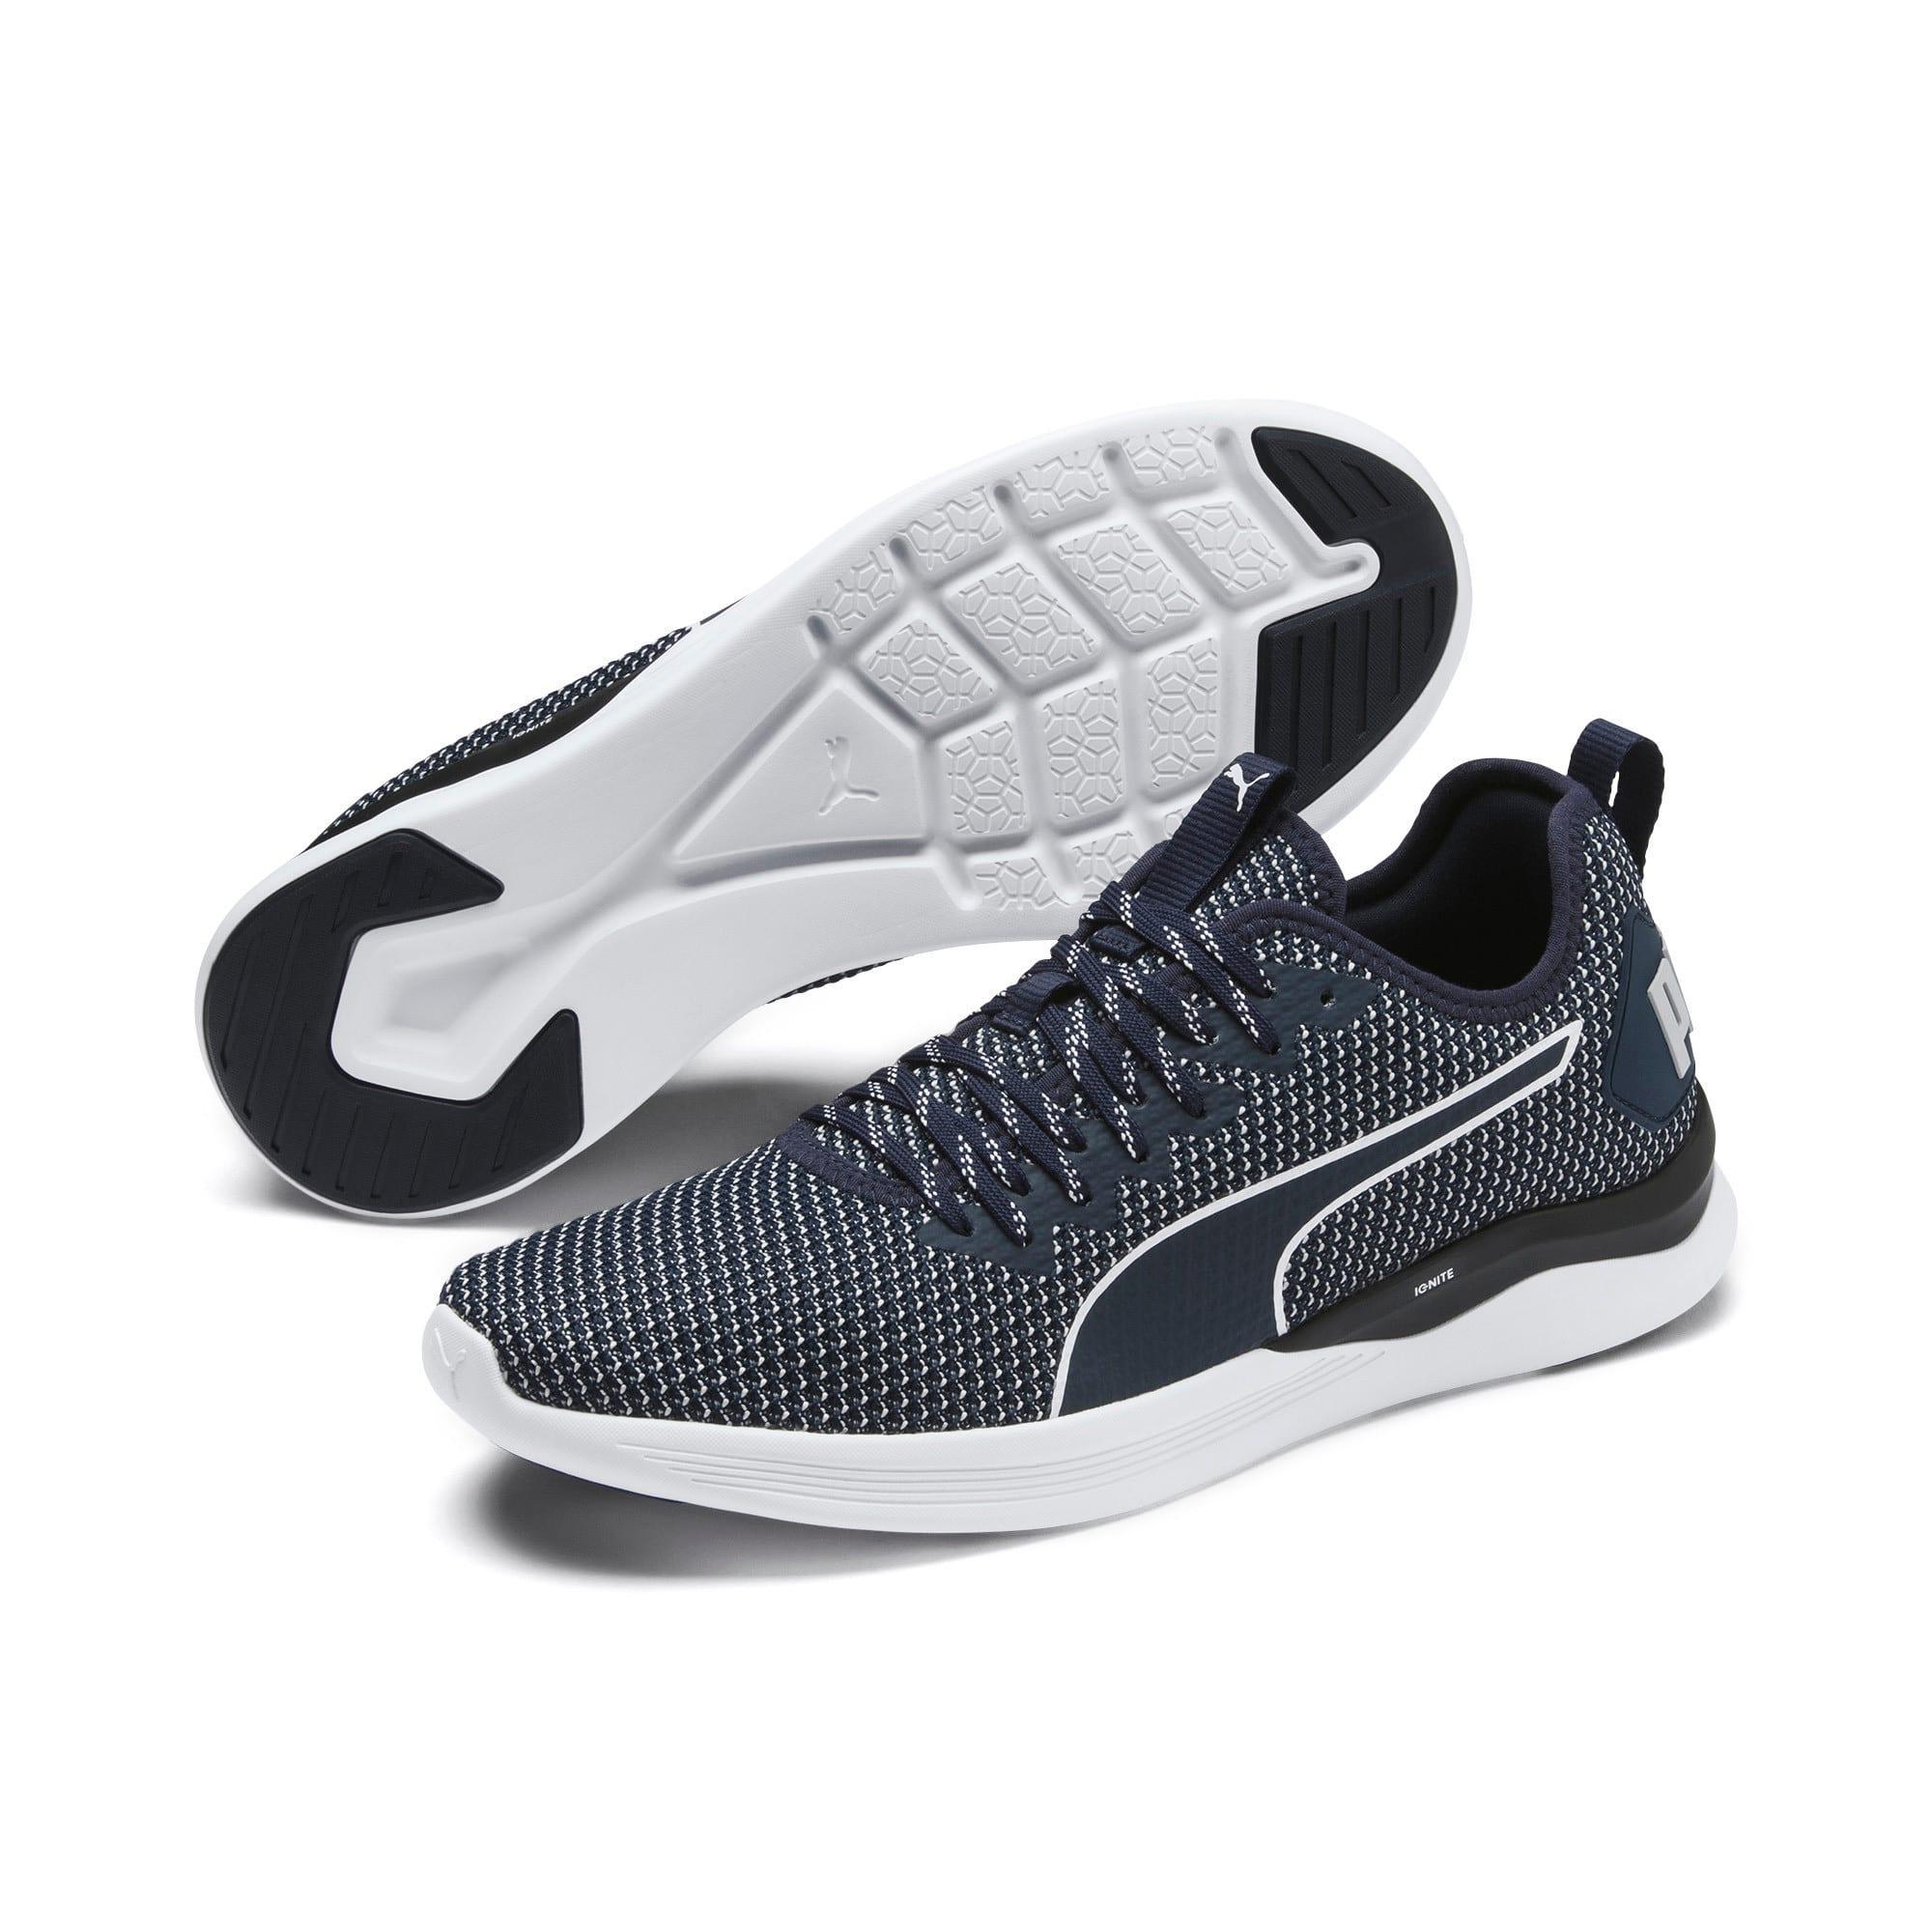 Thumbnail 2 of IGNITE Flash Men's Training Shoes, Peacoat-Glacier Gray-White, medium